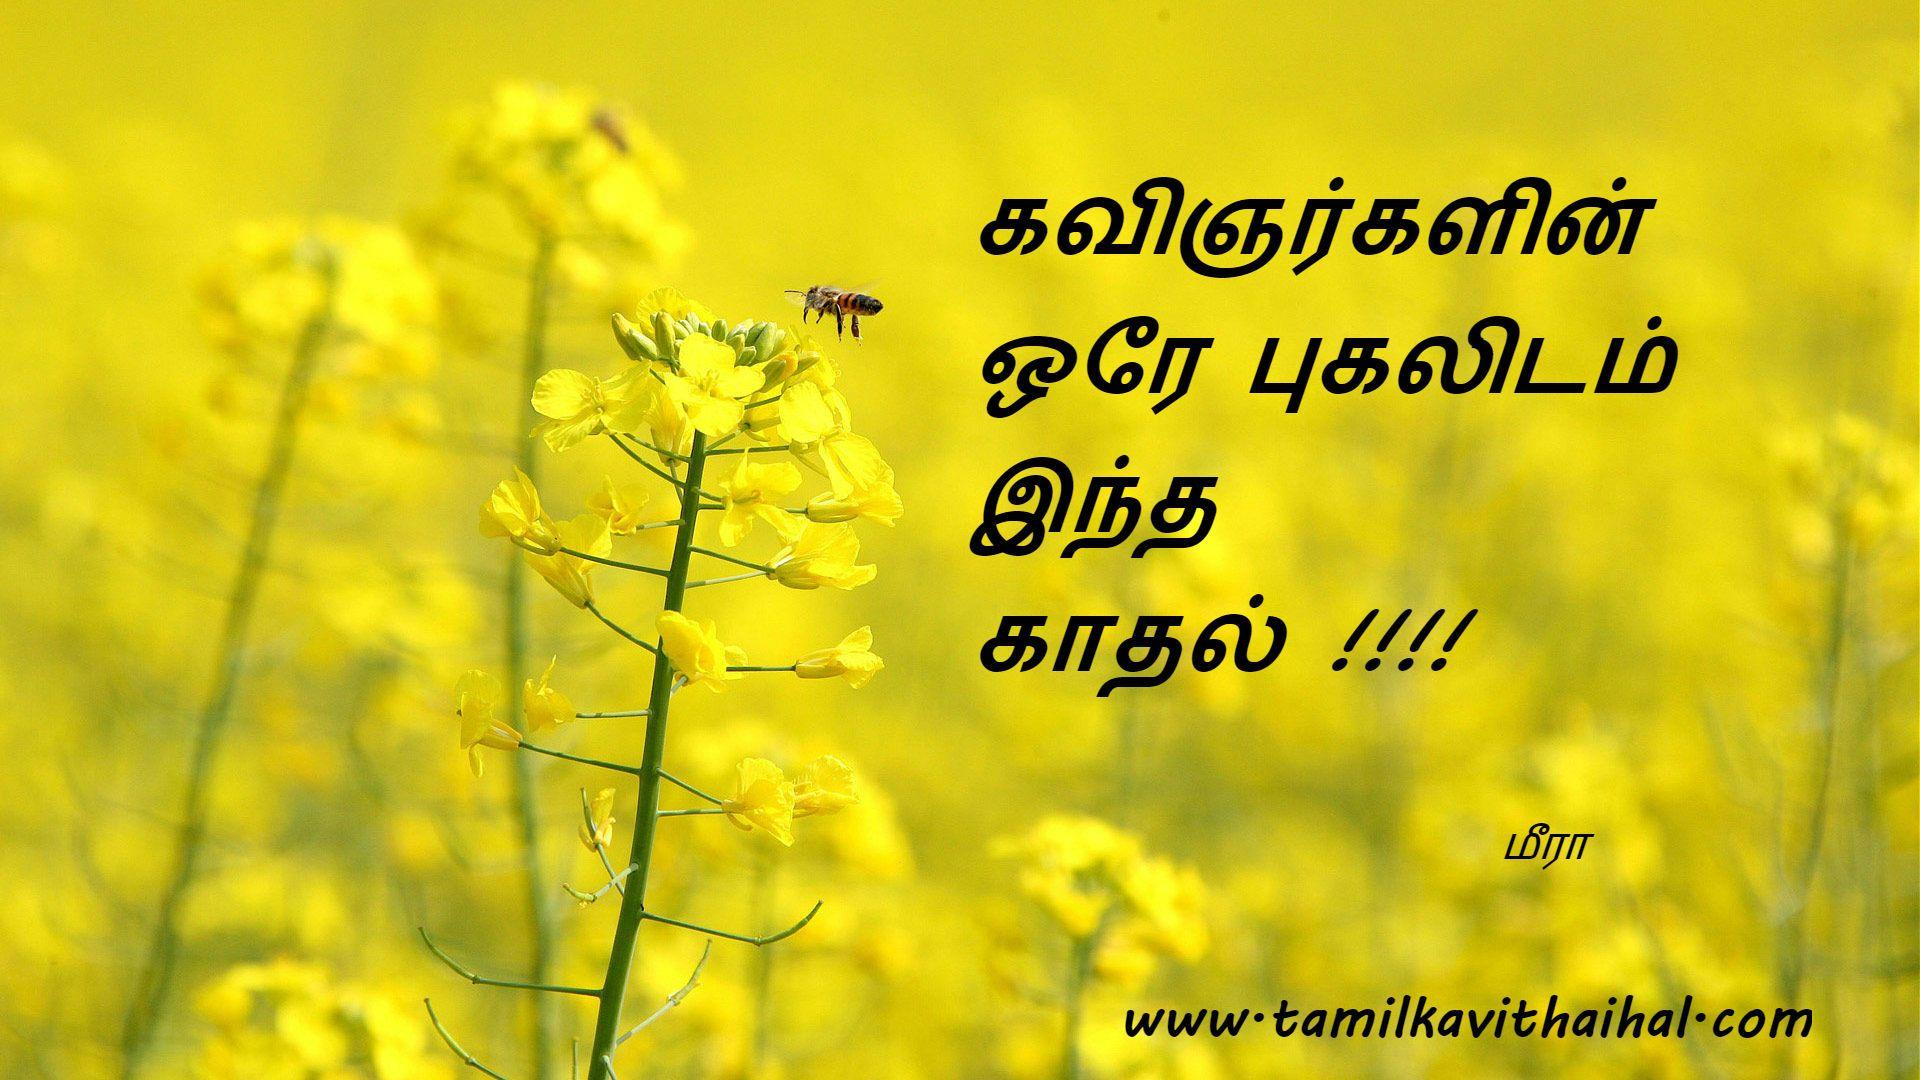 Tamil Kadhal Kavithai Kavingar Pugalidam Kavithaigal Hd Wallpaper